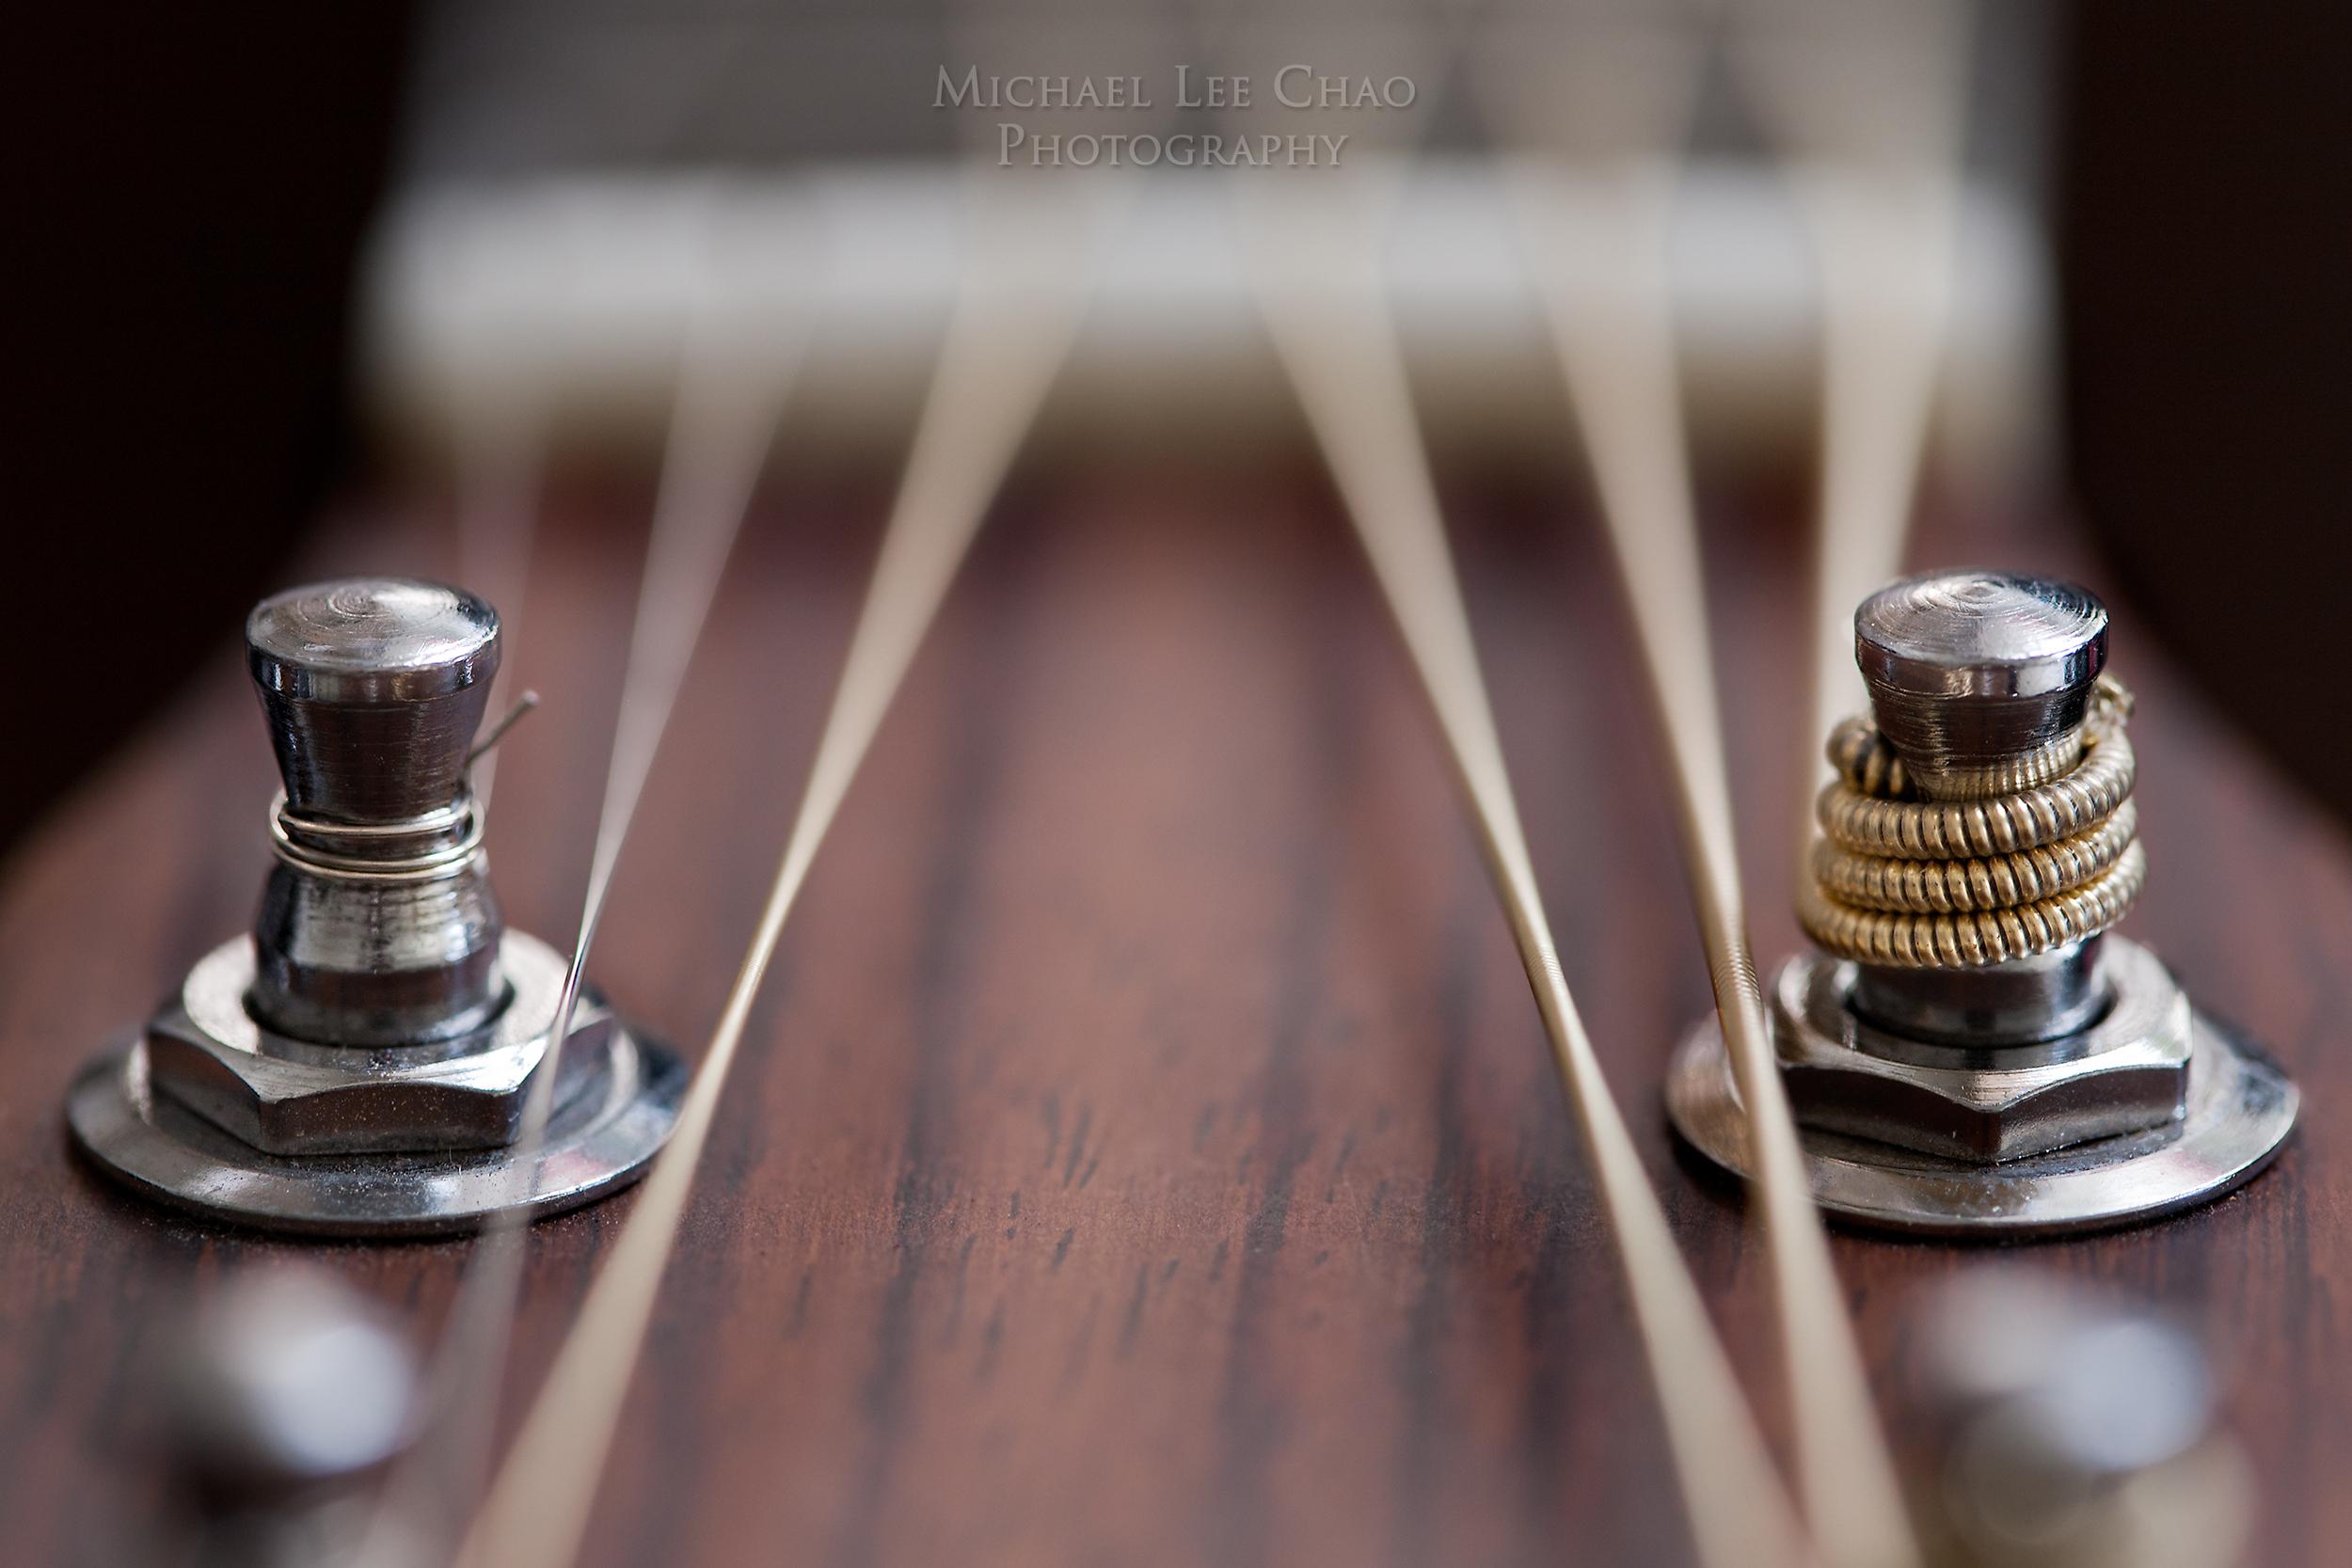 guitarposts-5654.jpg